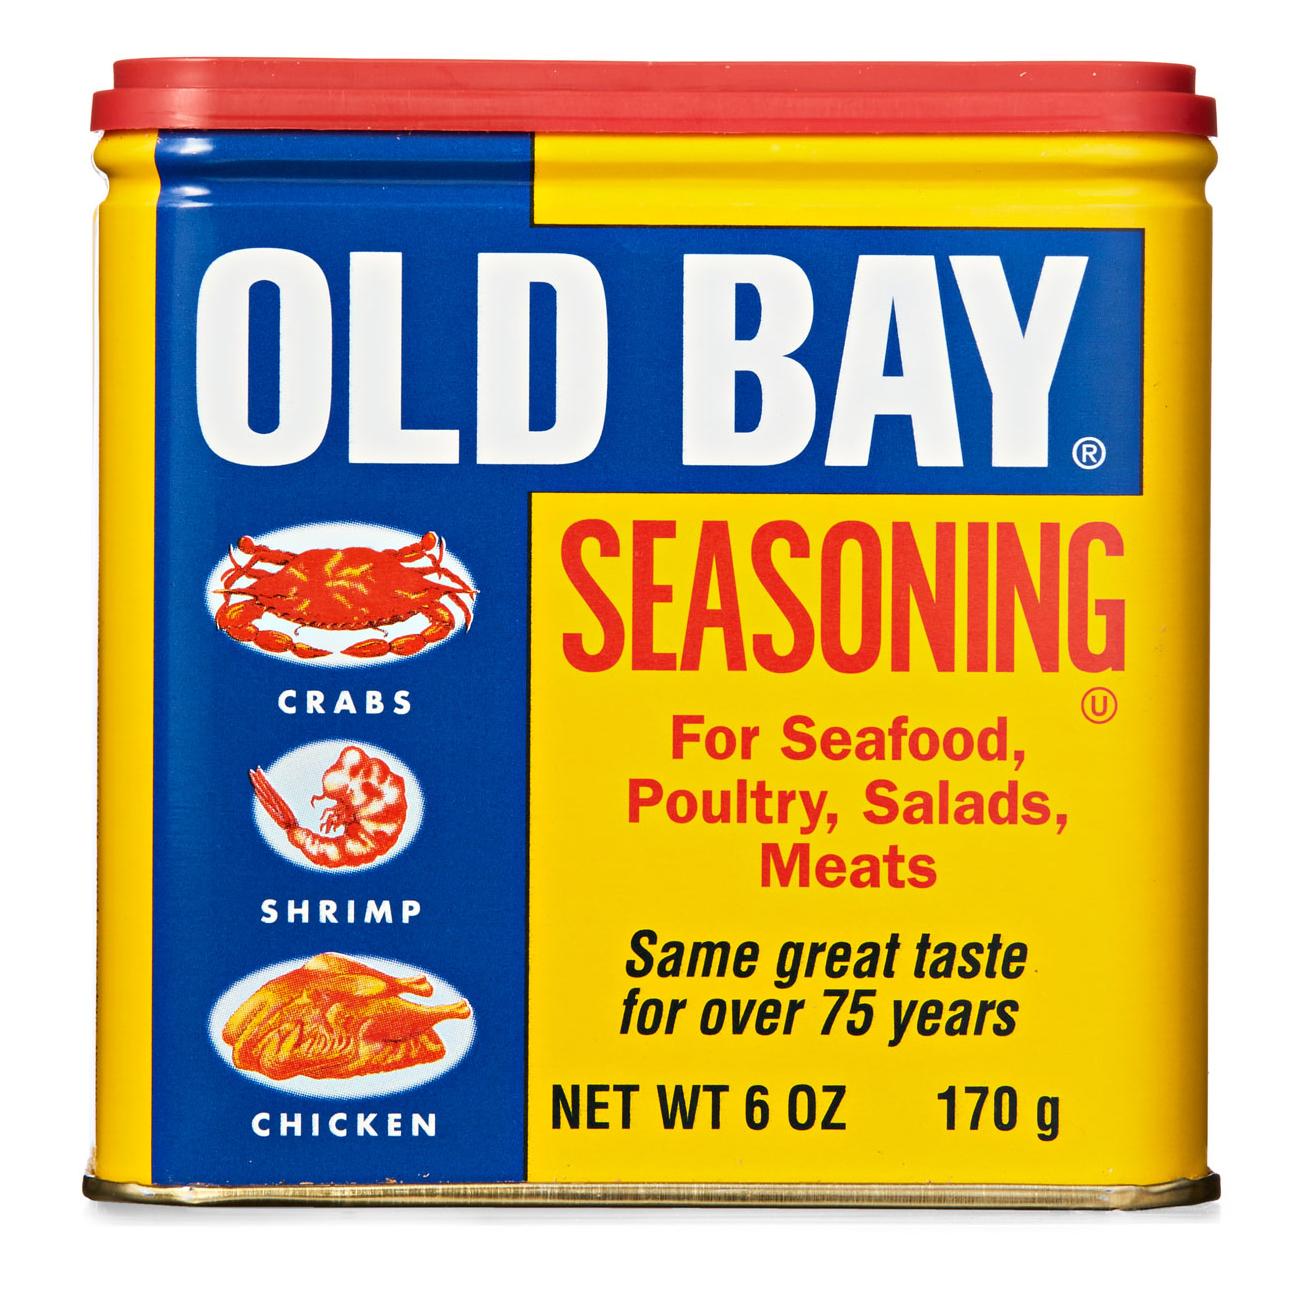 old bay seasoning can